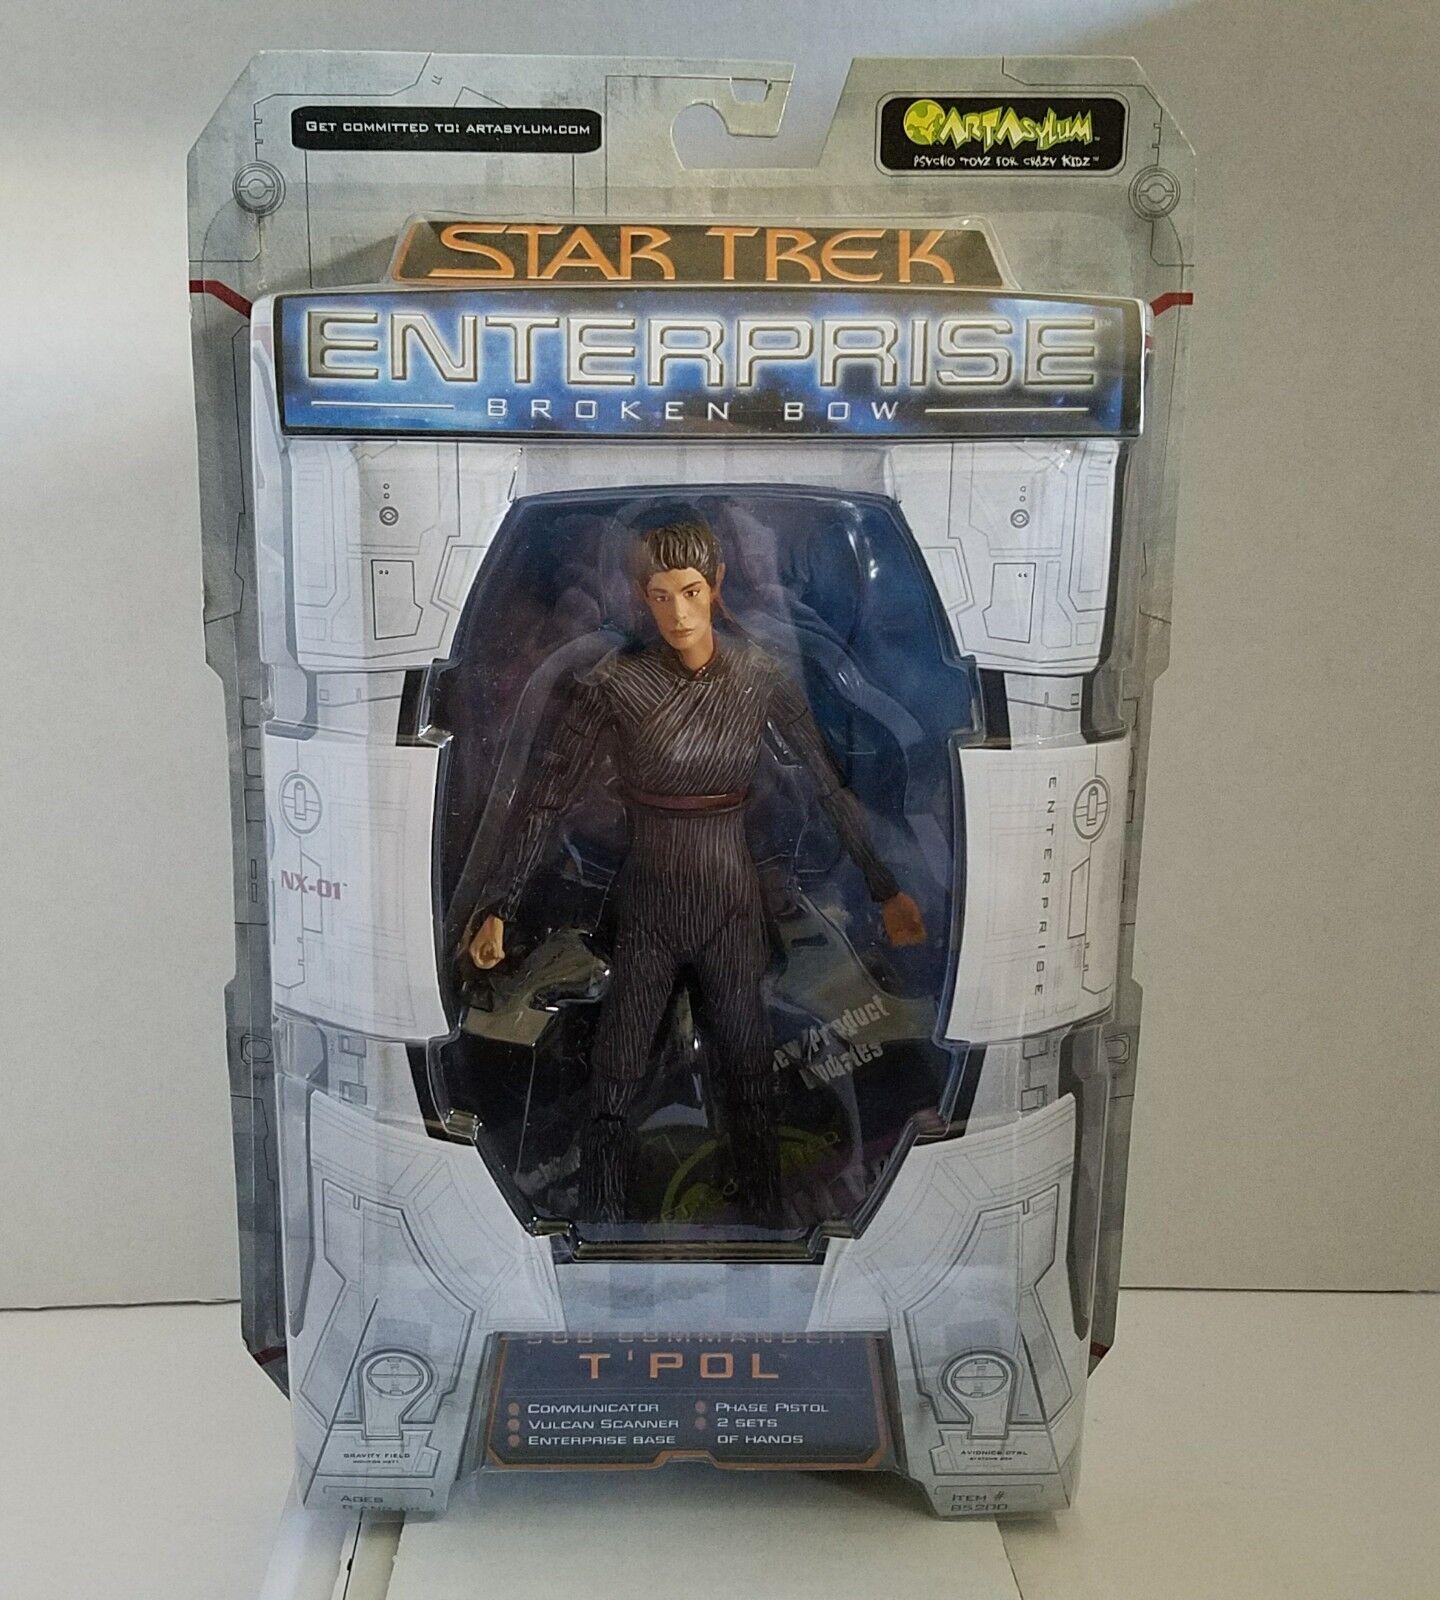 Art Asylum Star Trek Enterprise Broken Bow Sub Commander Commander Commander T'Pol Action Figure 72fa5e